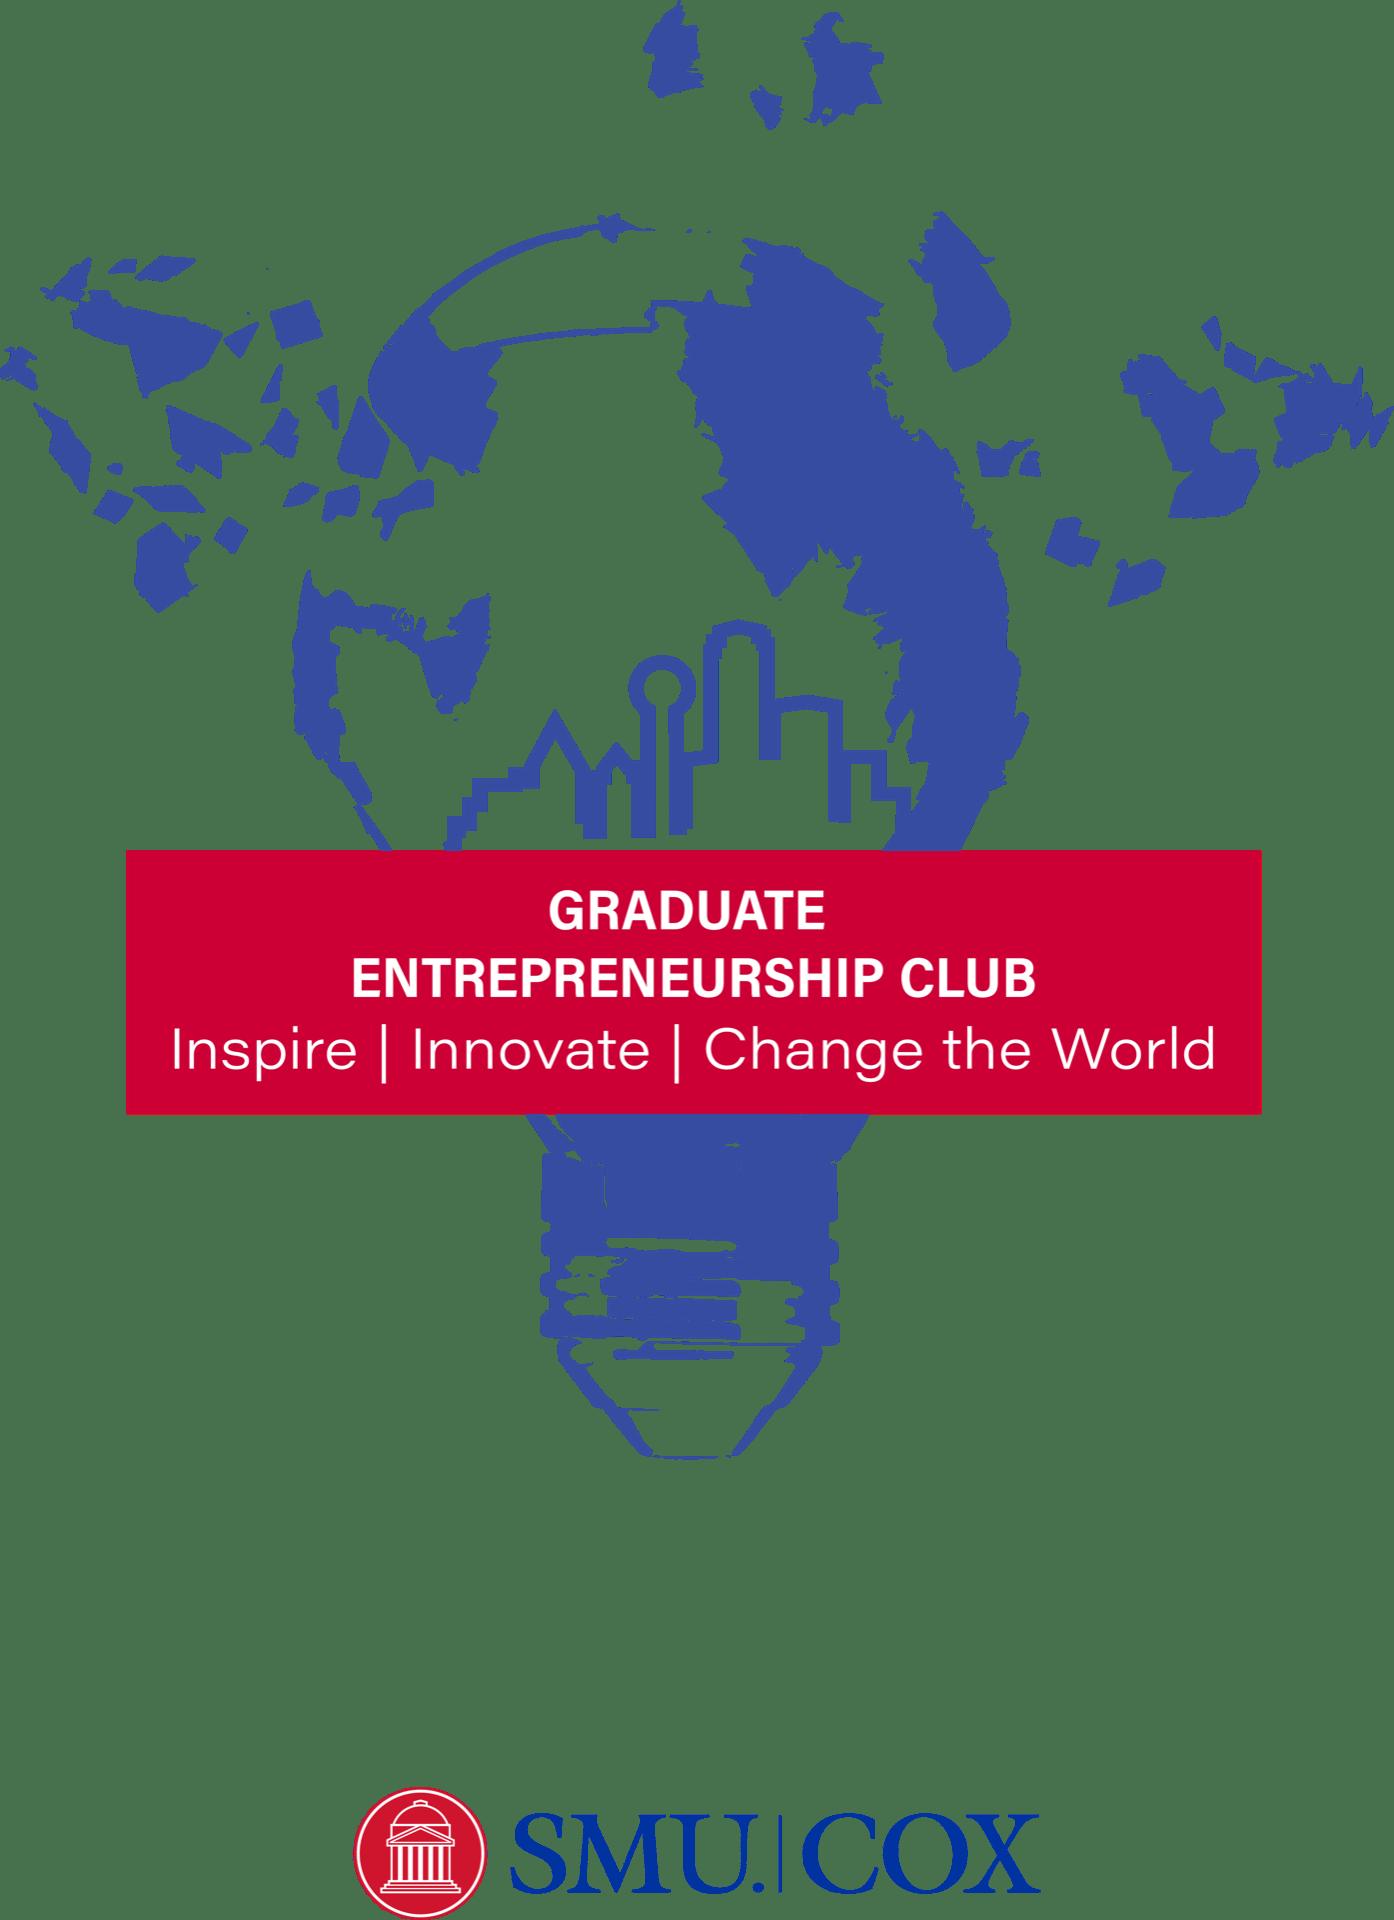 Cox Graduate Entrepreneurship Club